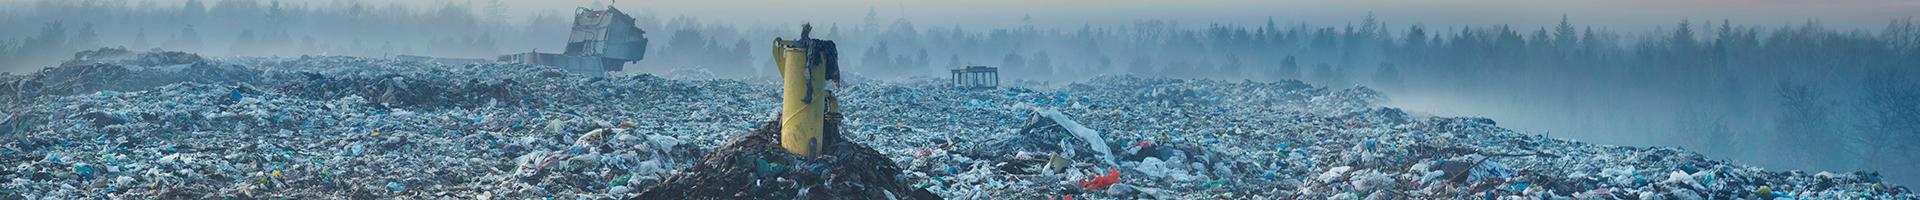 organics-recycling